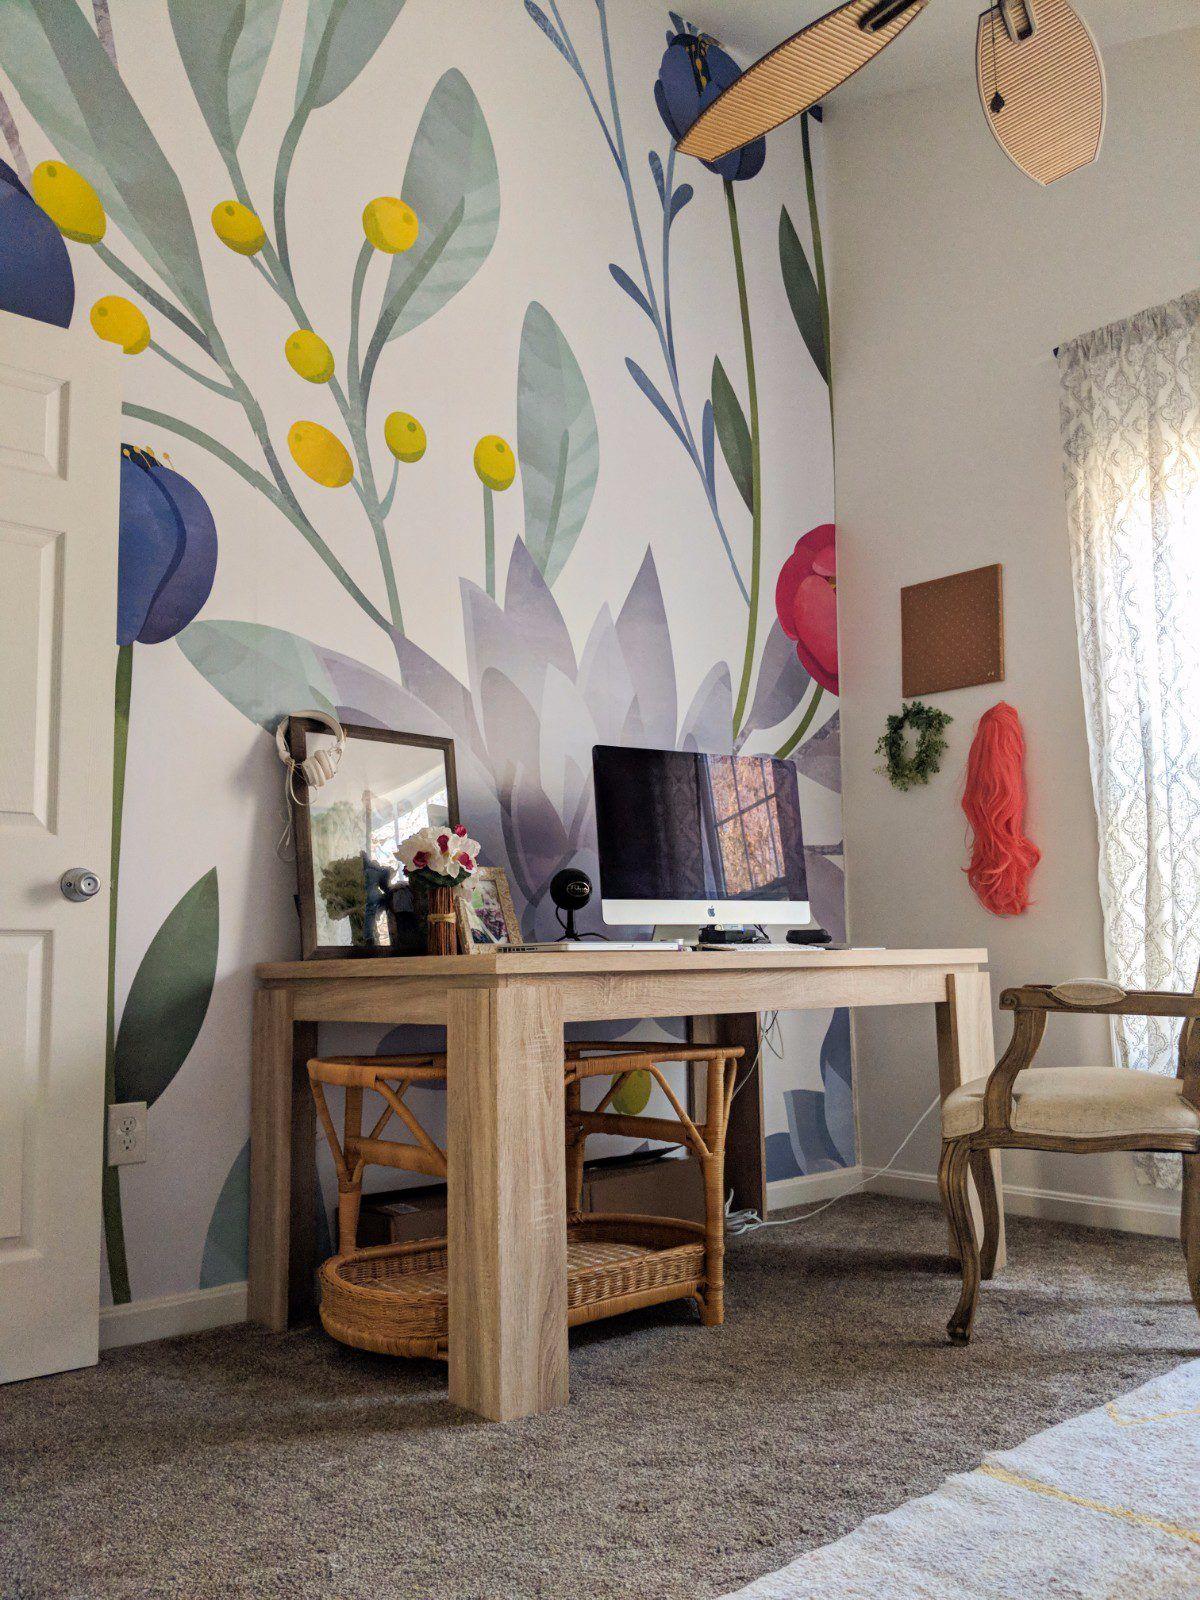 Cute home decor ideas. Flower wallpaper makeover. Making a